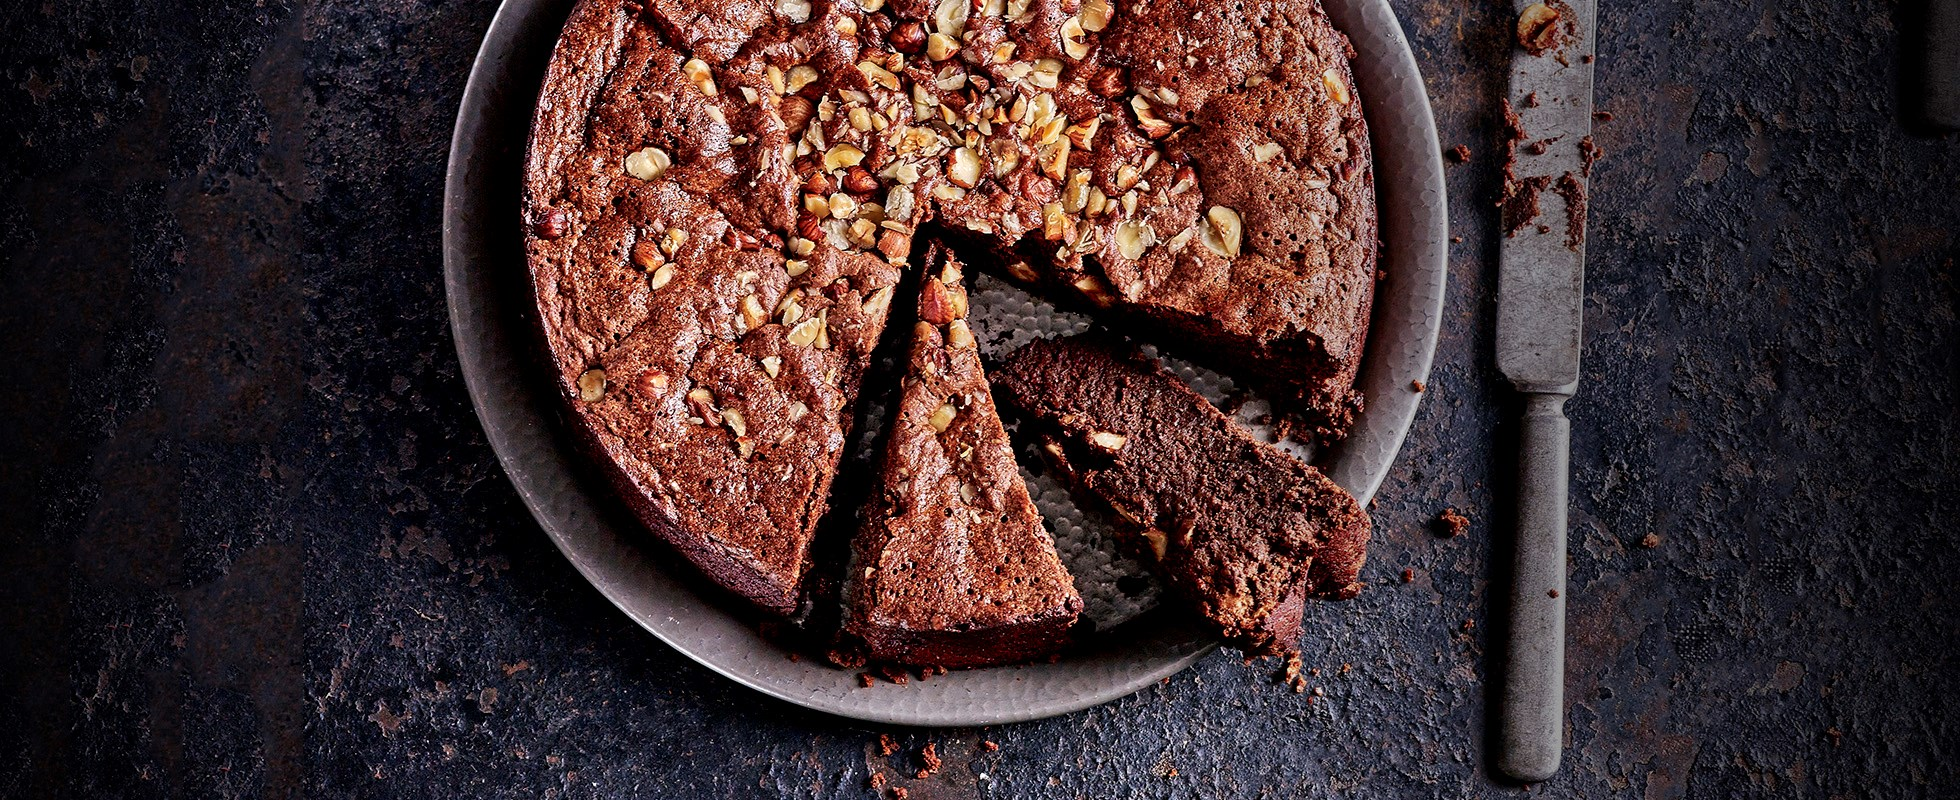 Sunken Nutella cake with Baileys cream